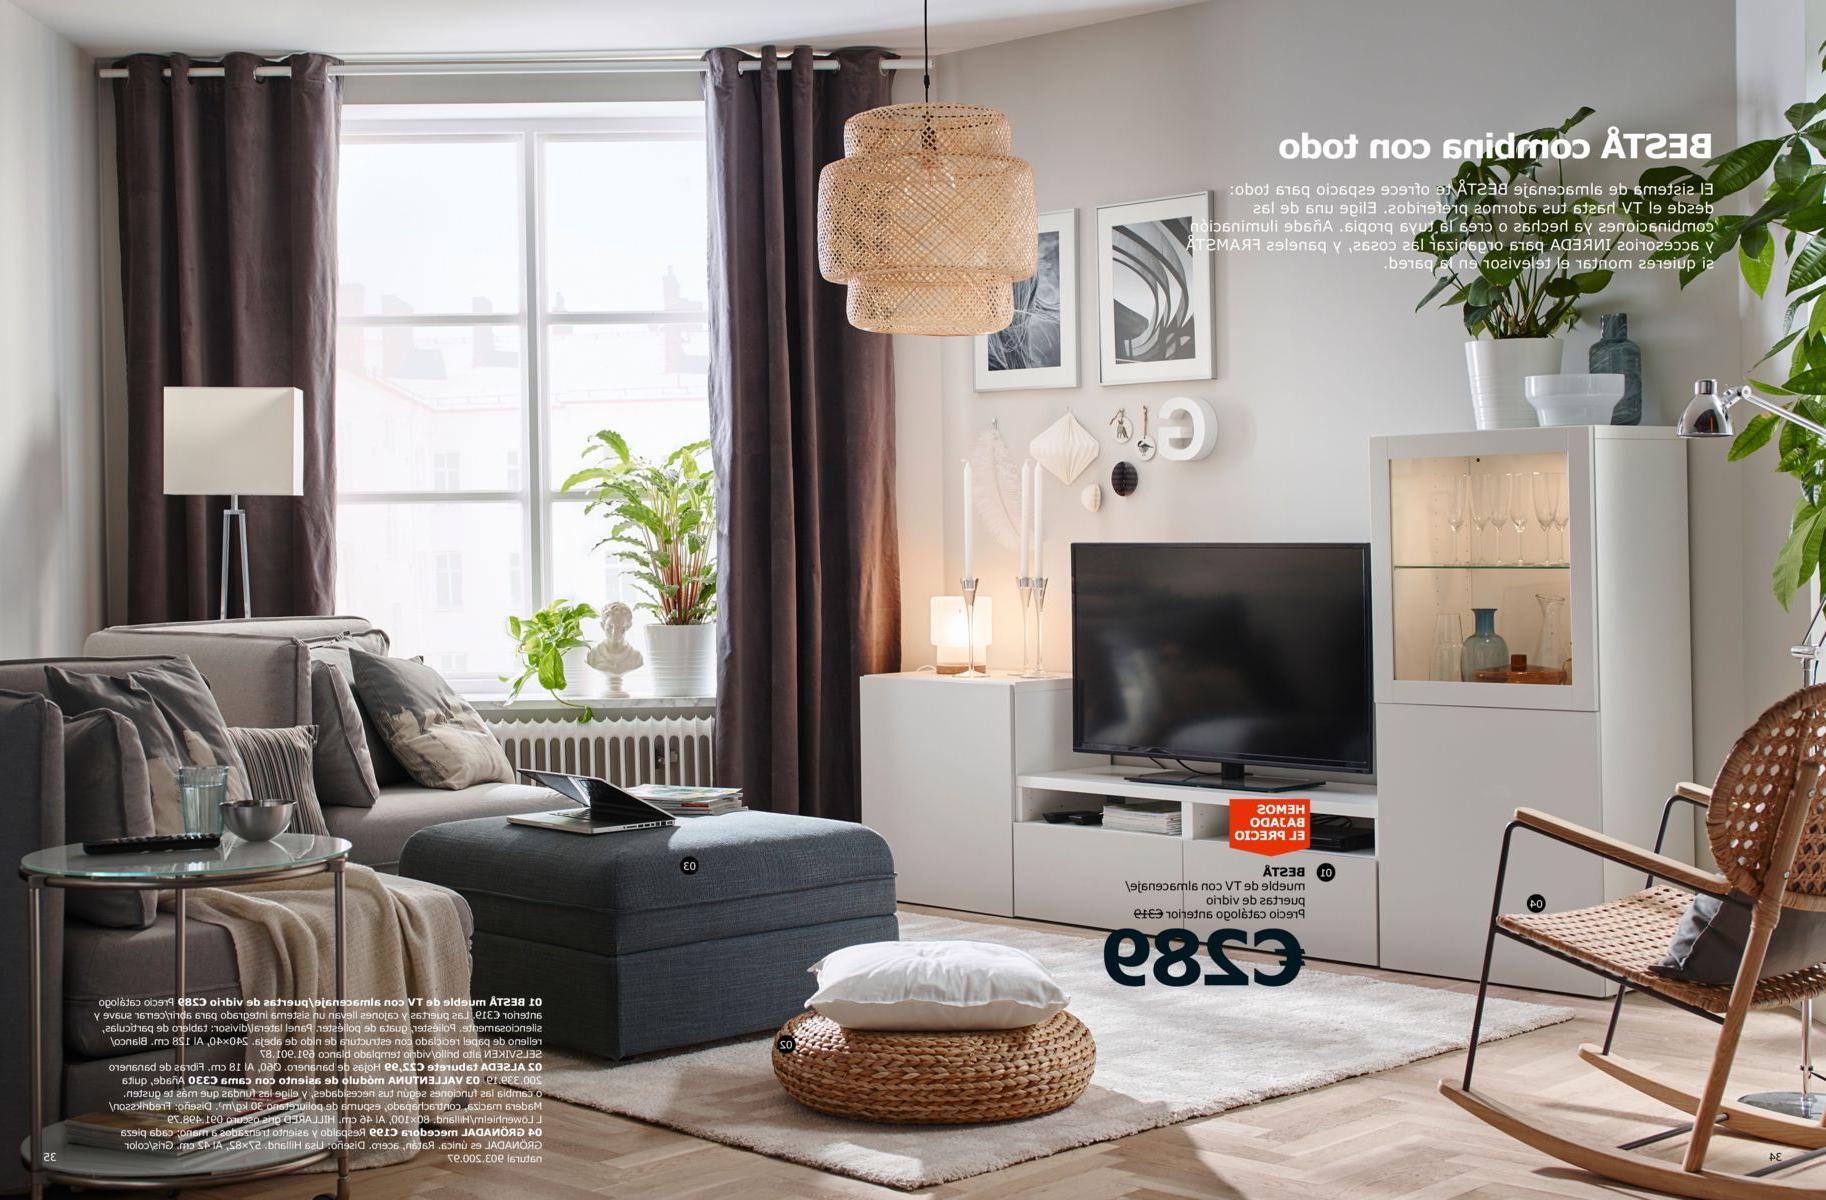 Muebles De Salon Ikea Ofertas Gdd0 Catà Logo Ikea 2018 Muebles De Salà N Imuebles